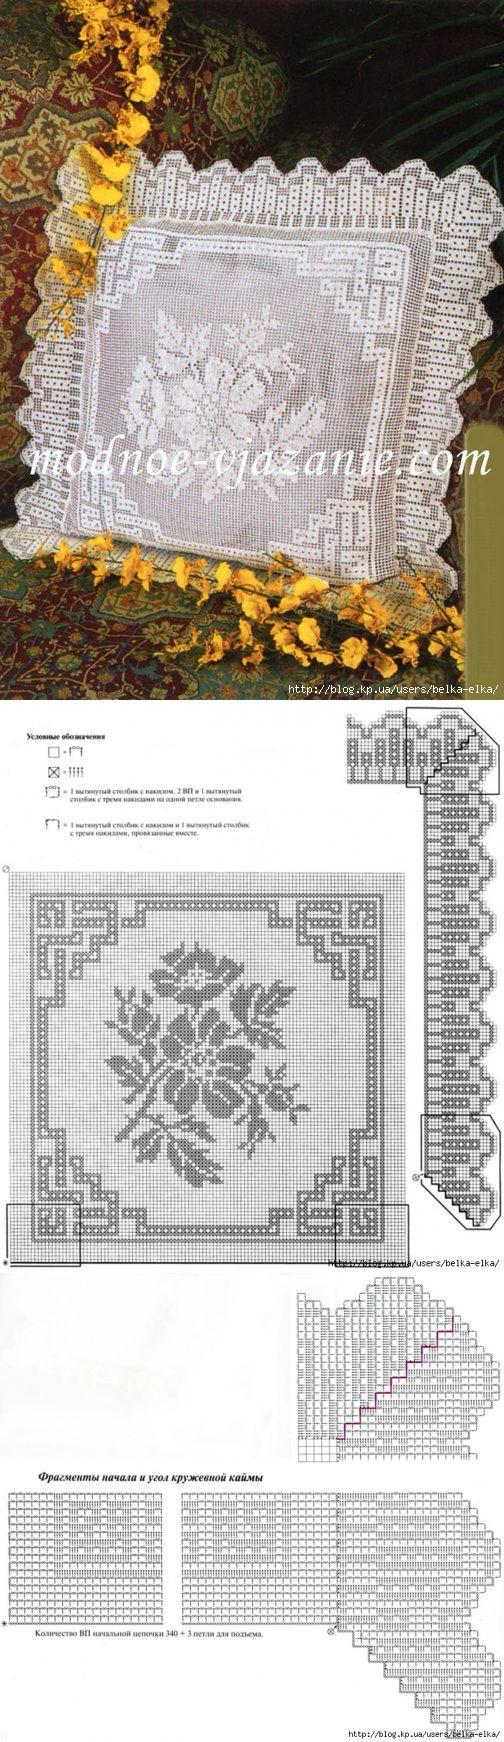 cojin crochet-esquema-patron-otakulandia.es (11)